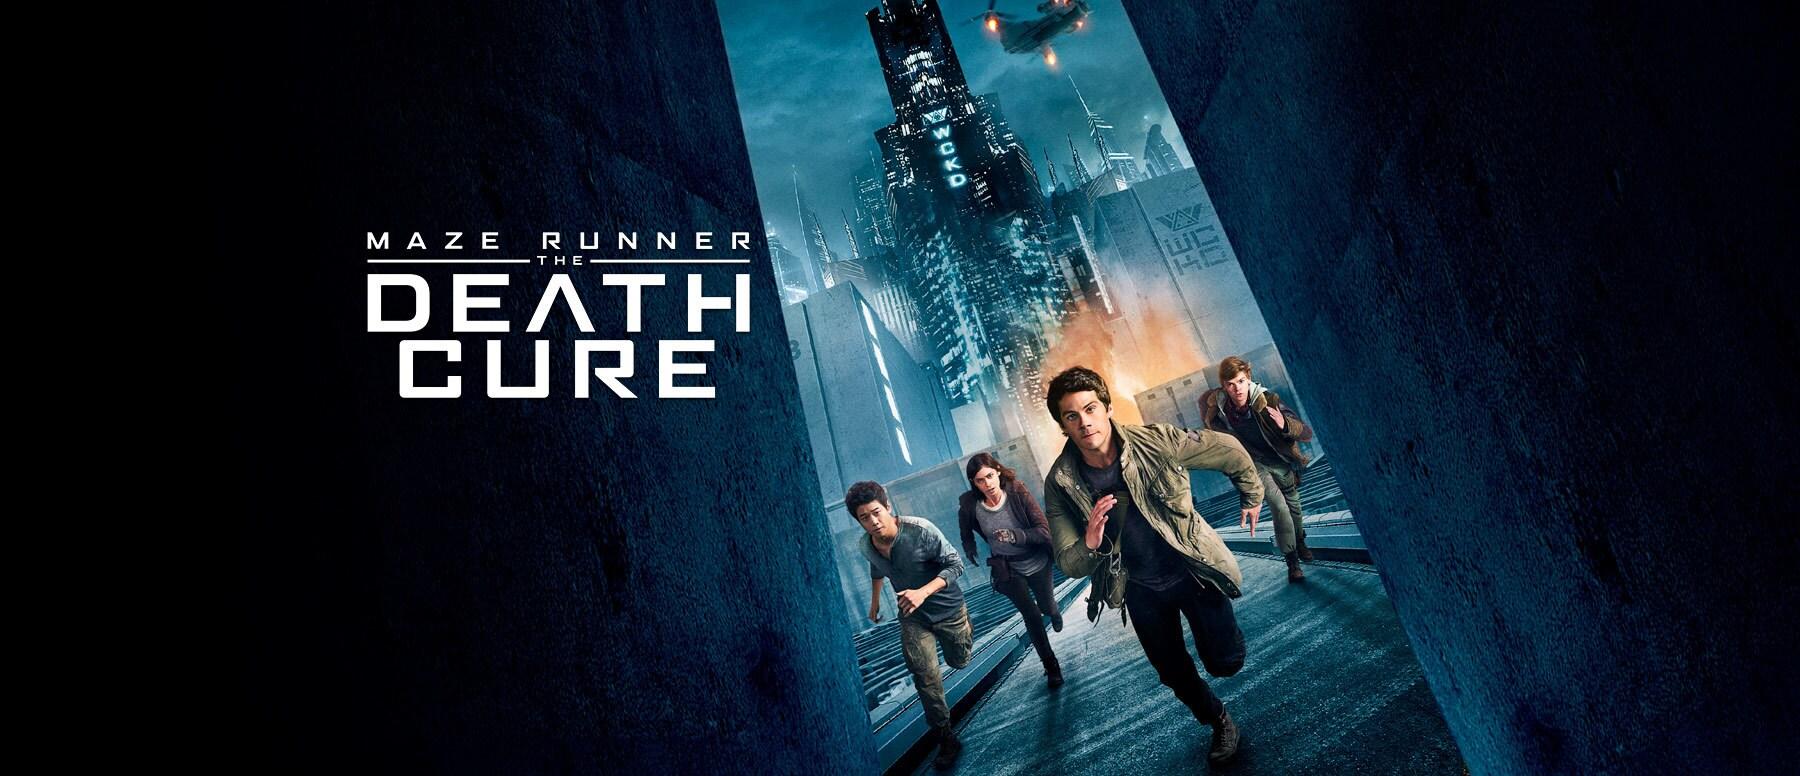 Maze Runner The Death Cure 20th Century Studios